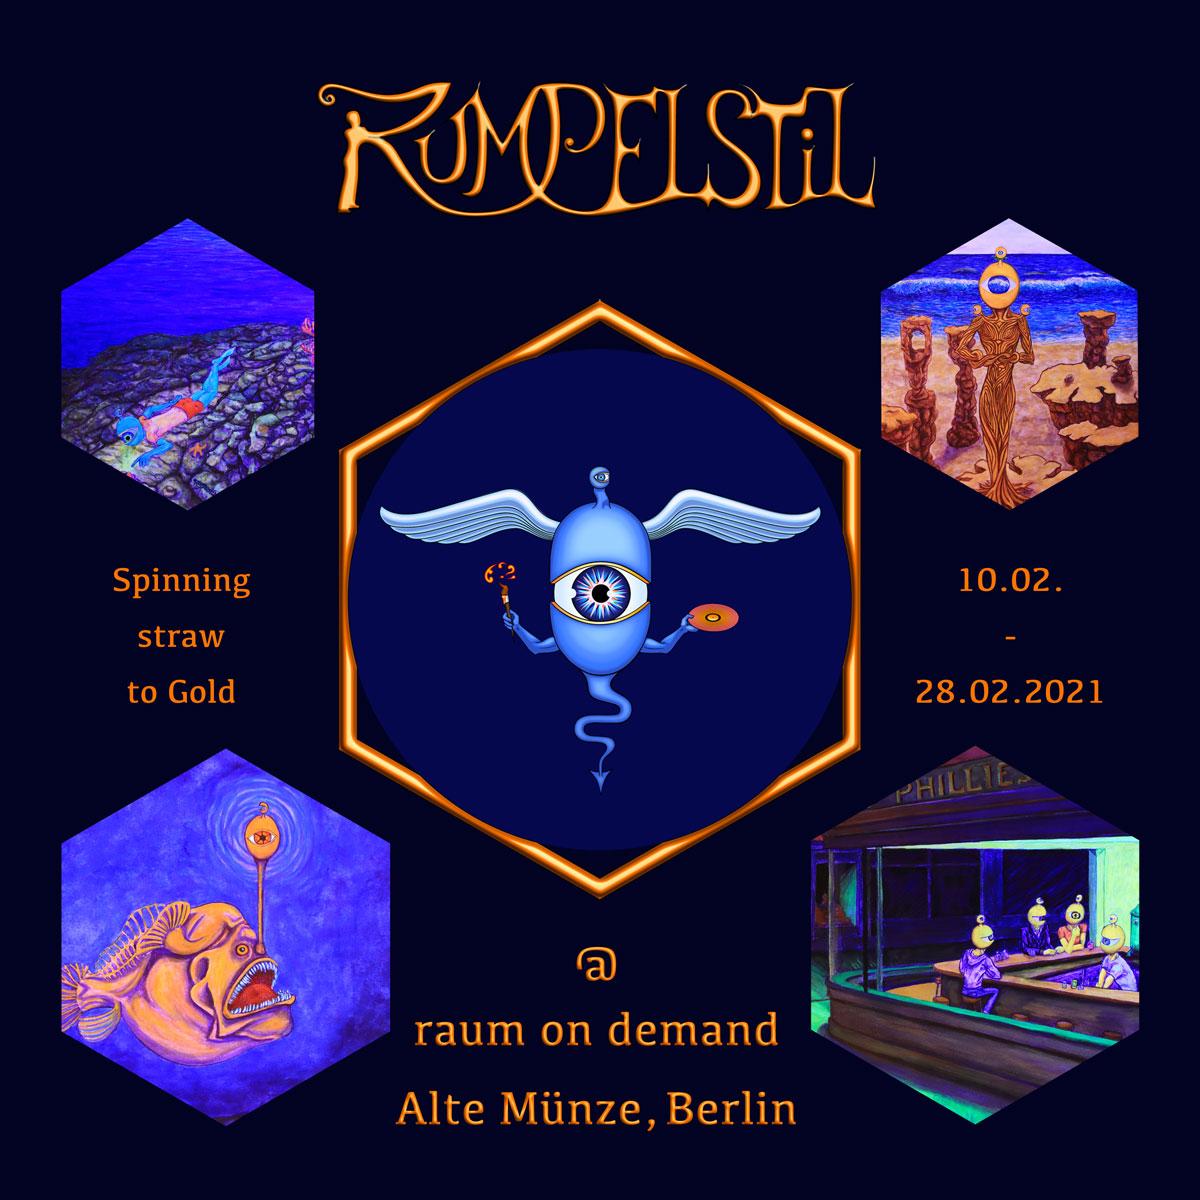 [Xb]_Rumpelstil @ raum on demand – AlteMünze